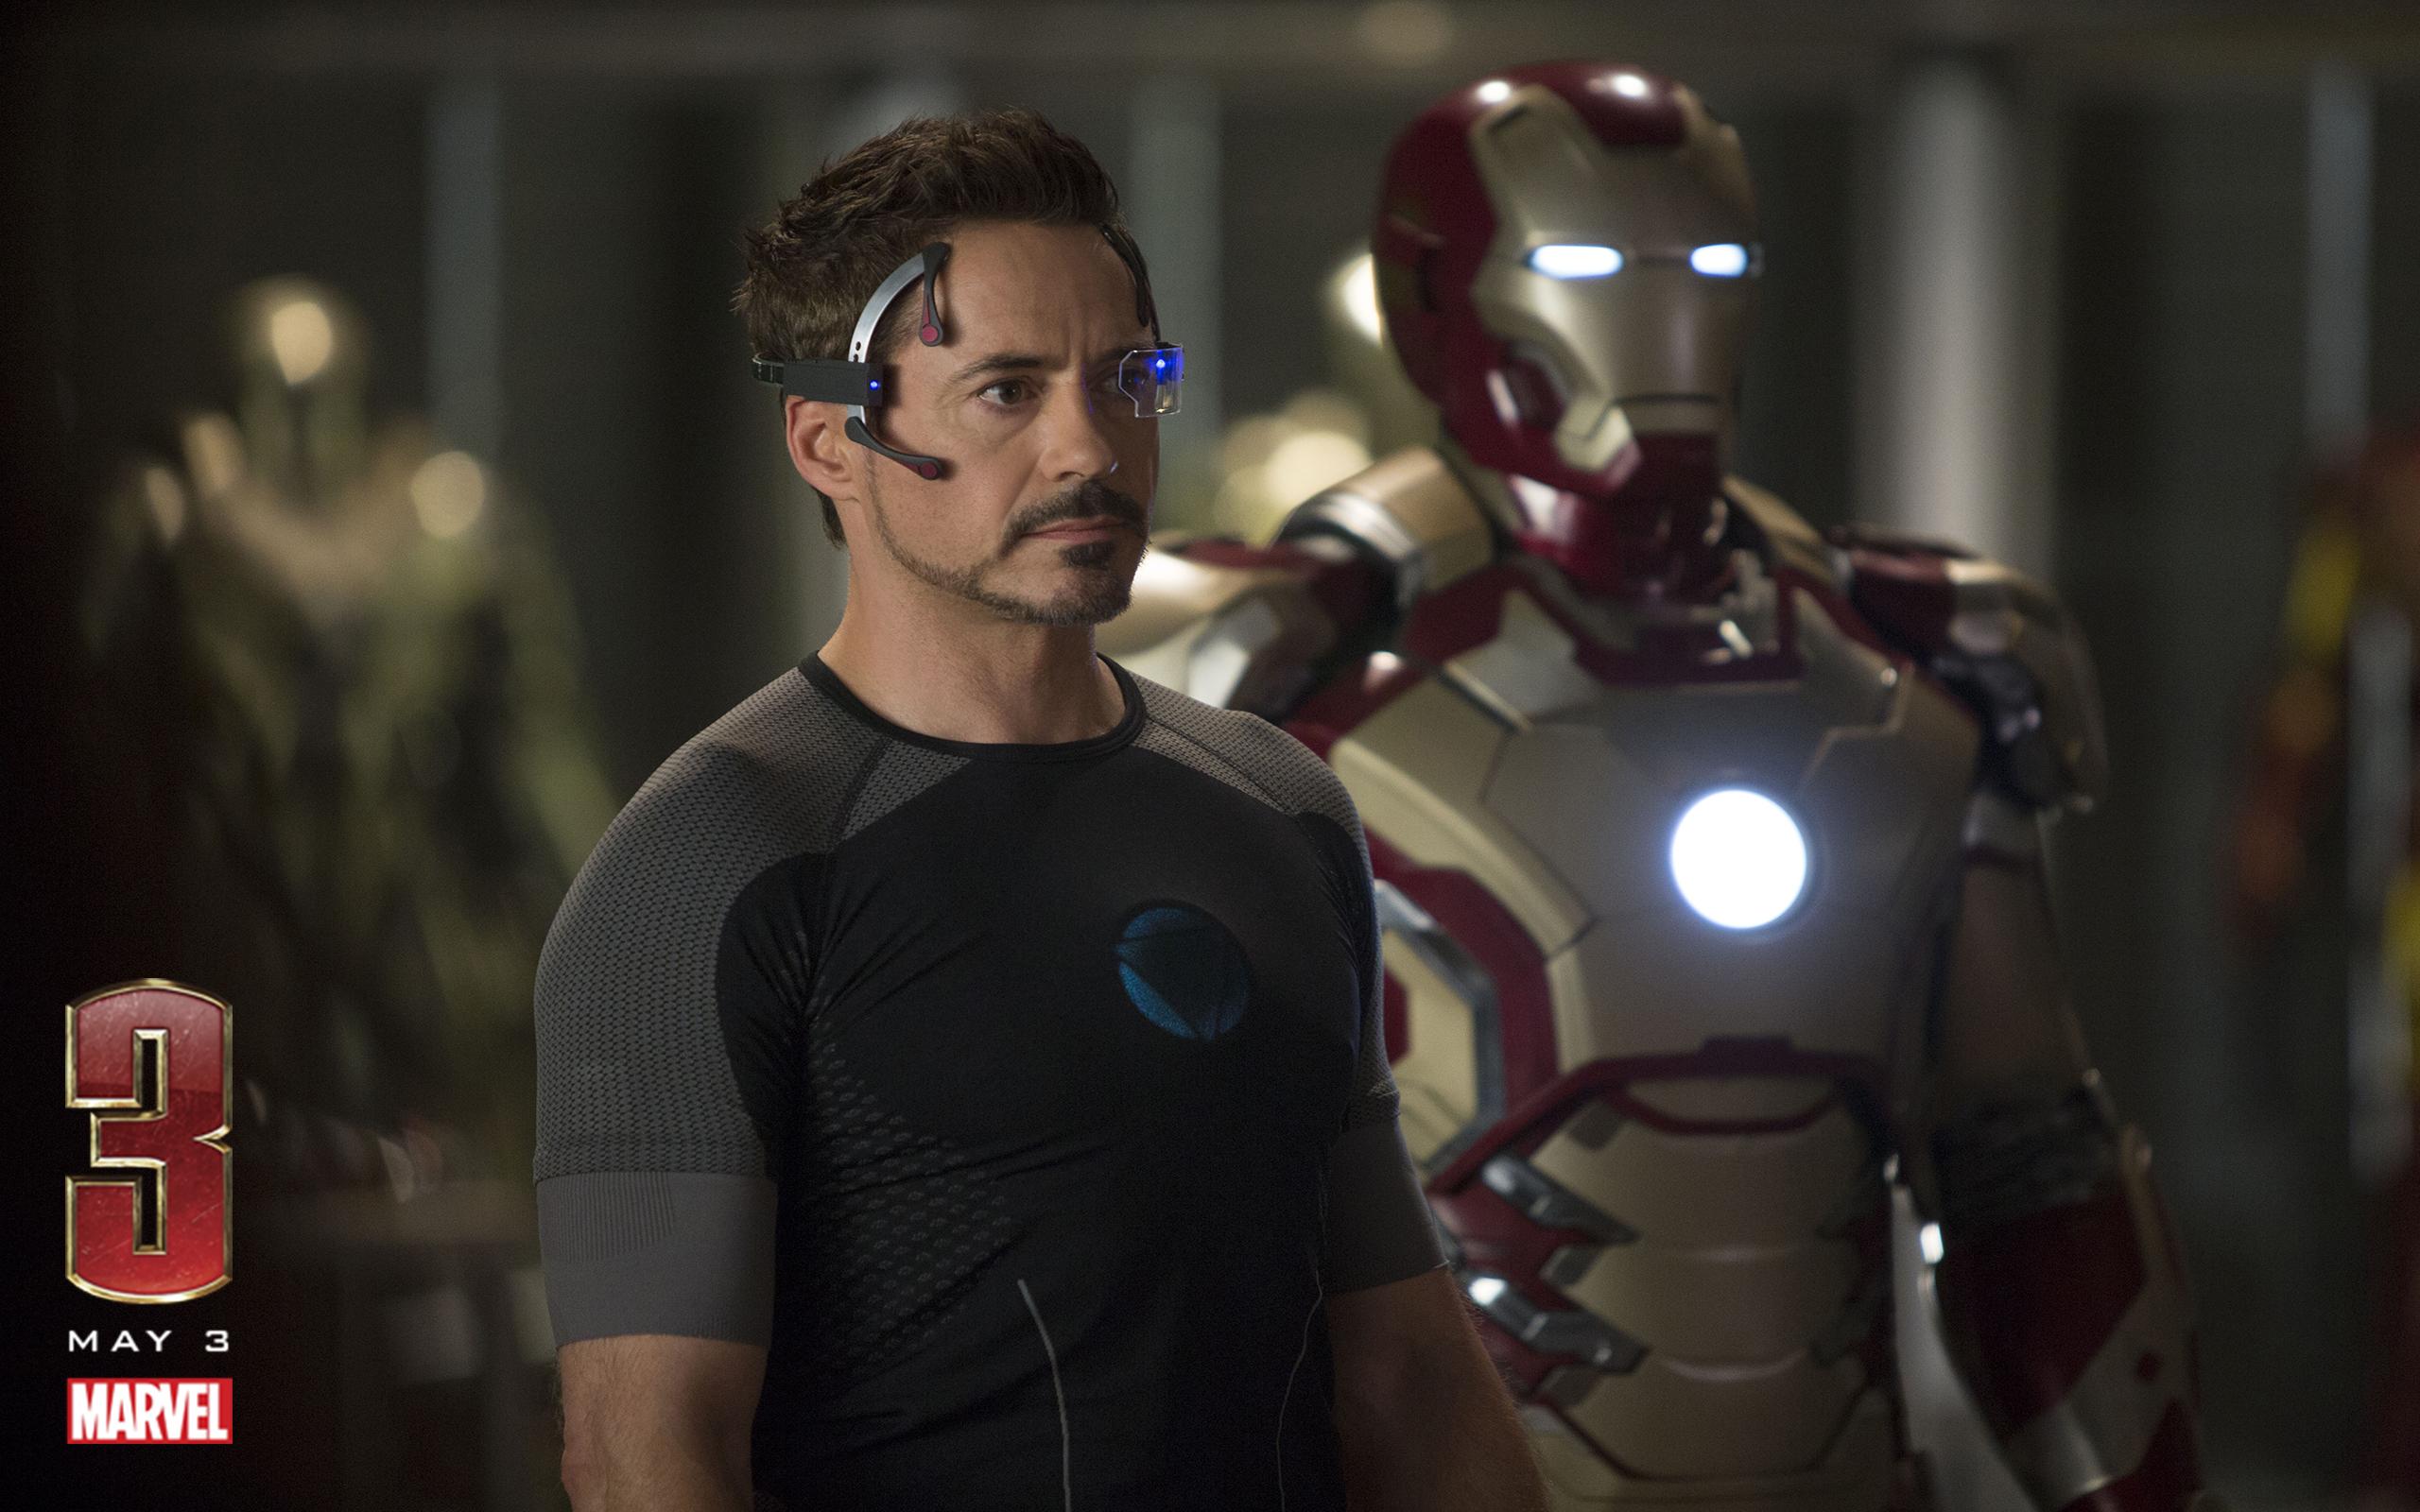 iron man 3 hd wallpaper | background image | 2560x1600 | id:334985